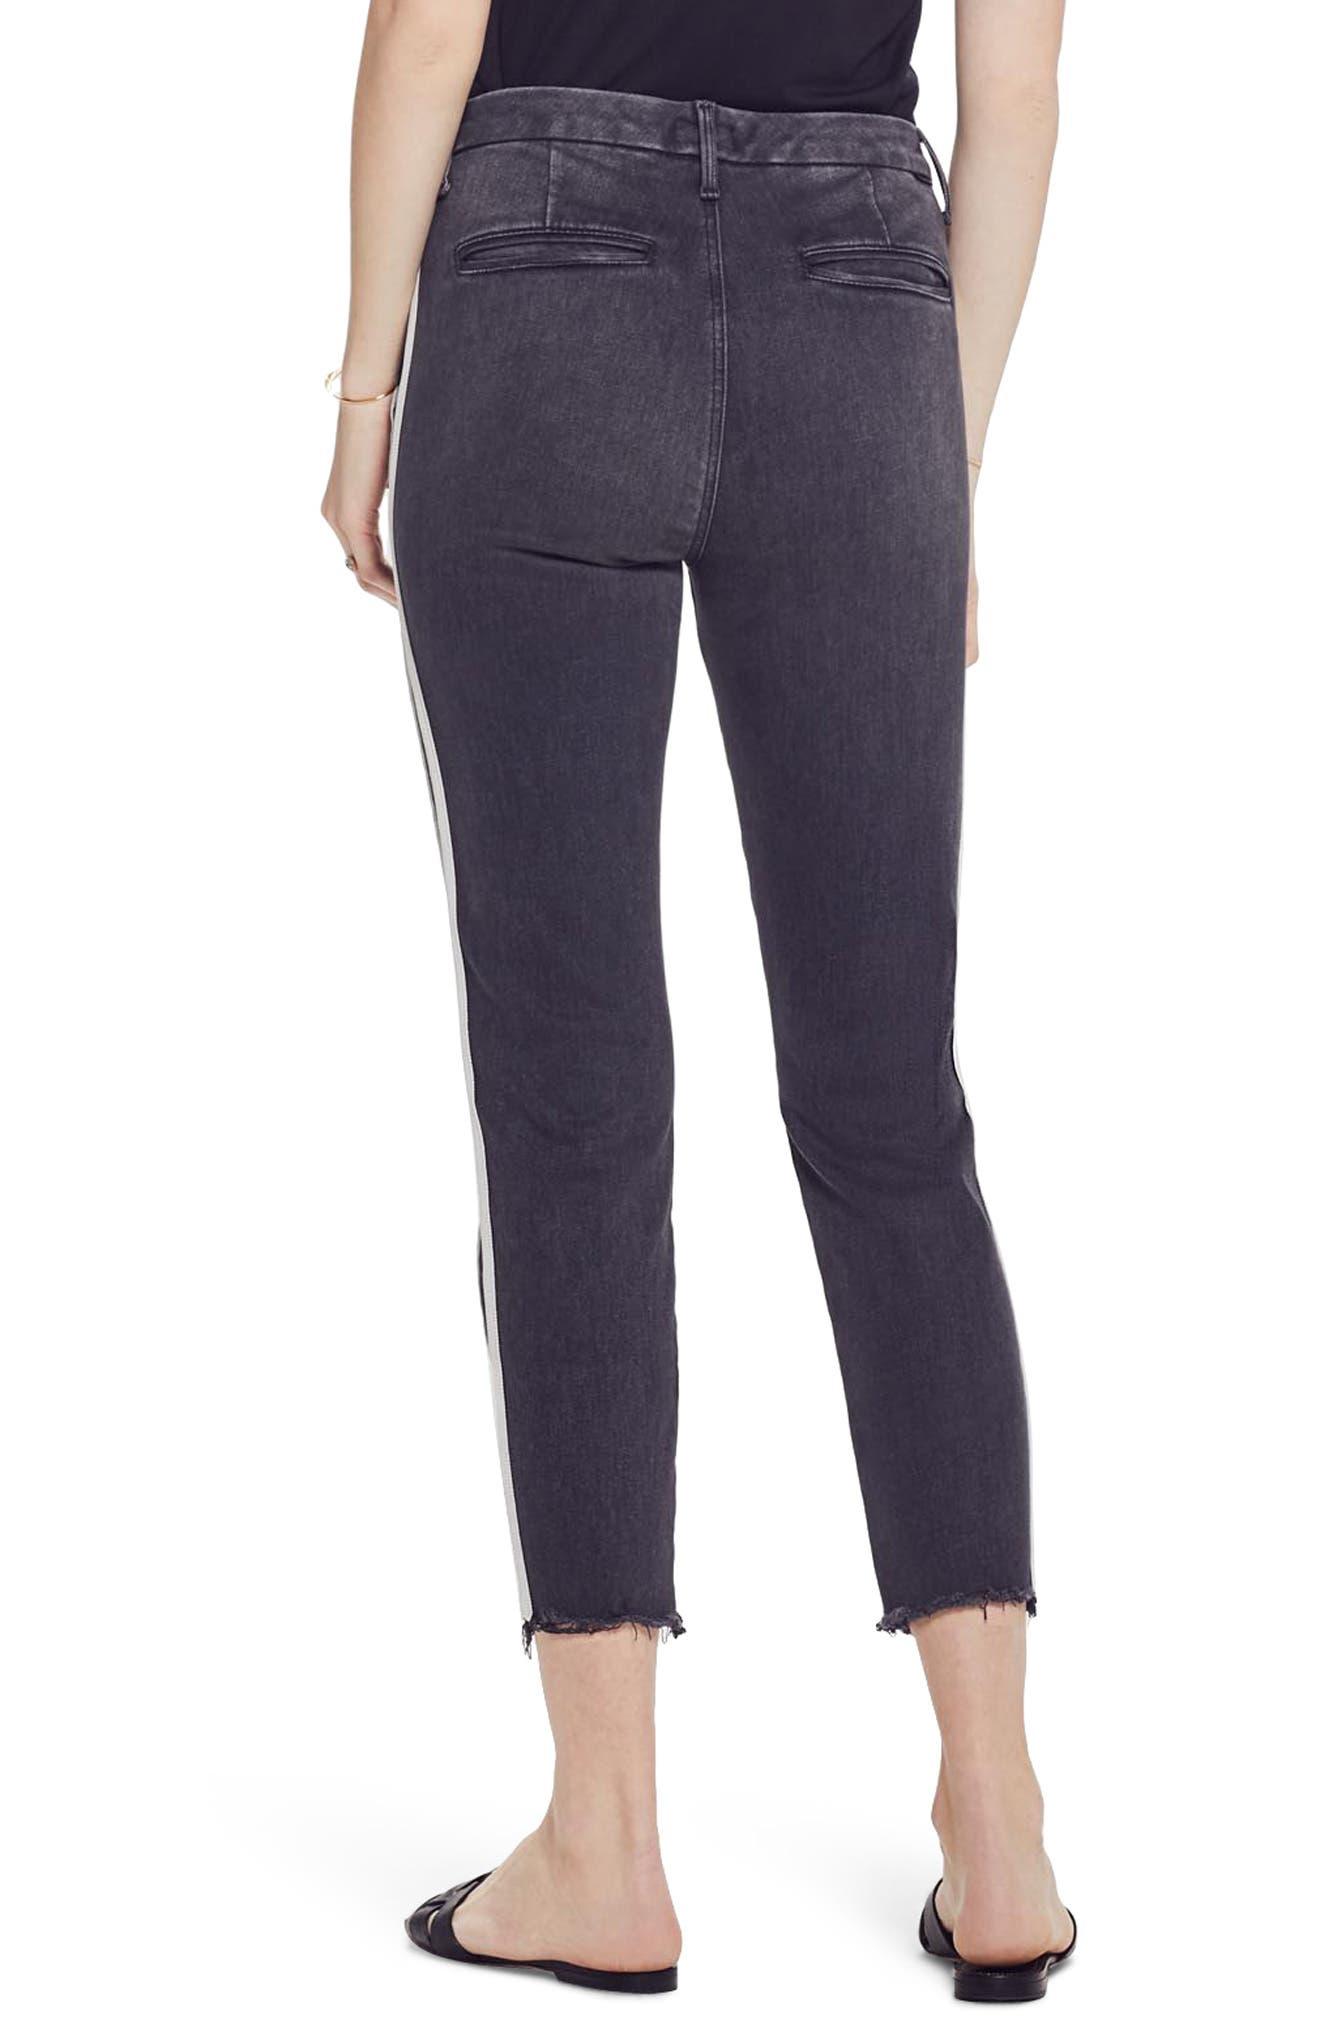 MOTHER, The Shaker Prep High Waist Crop Slim Jeans, Alternate thumbnail 2, color, DEAR MR. BLACK RACER